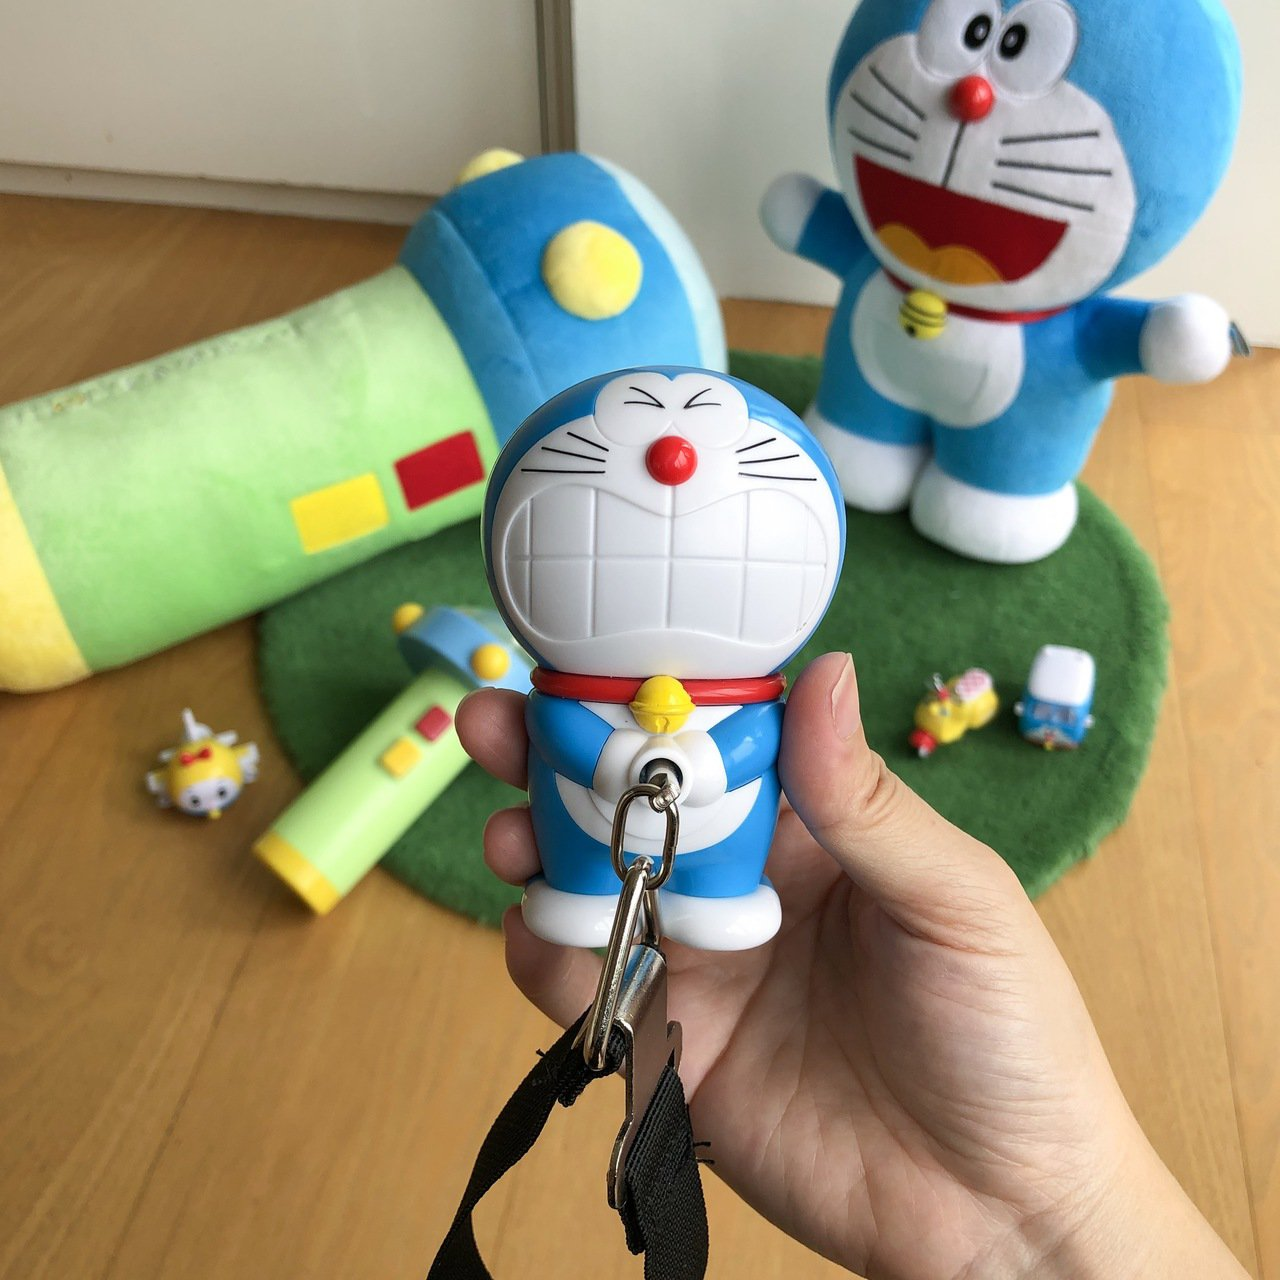 7-ELEVEN於9月11日下午3點起開放「哆啦A夢神奇道具」第二波限量商品預購...